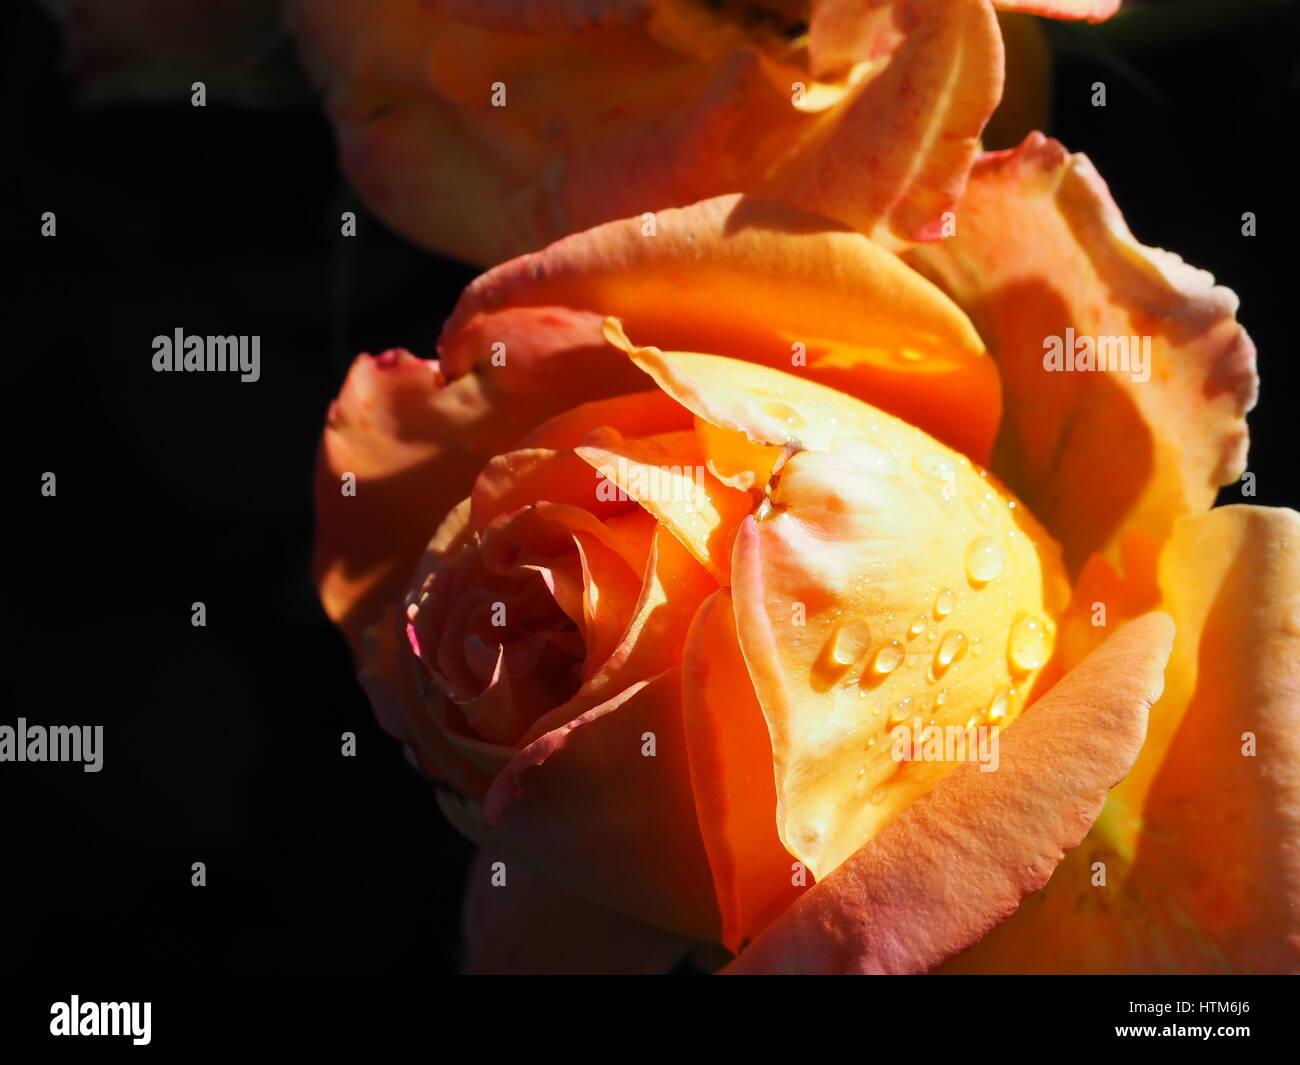 High Contrast orange rose with water droplets. Washington Park, Portland, Oregon - Stock Image